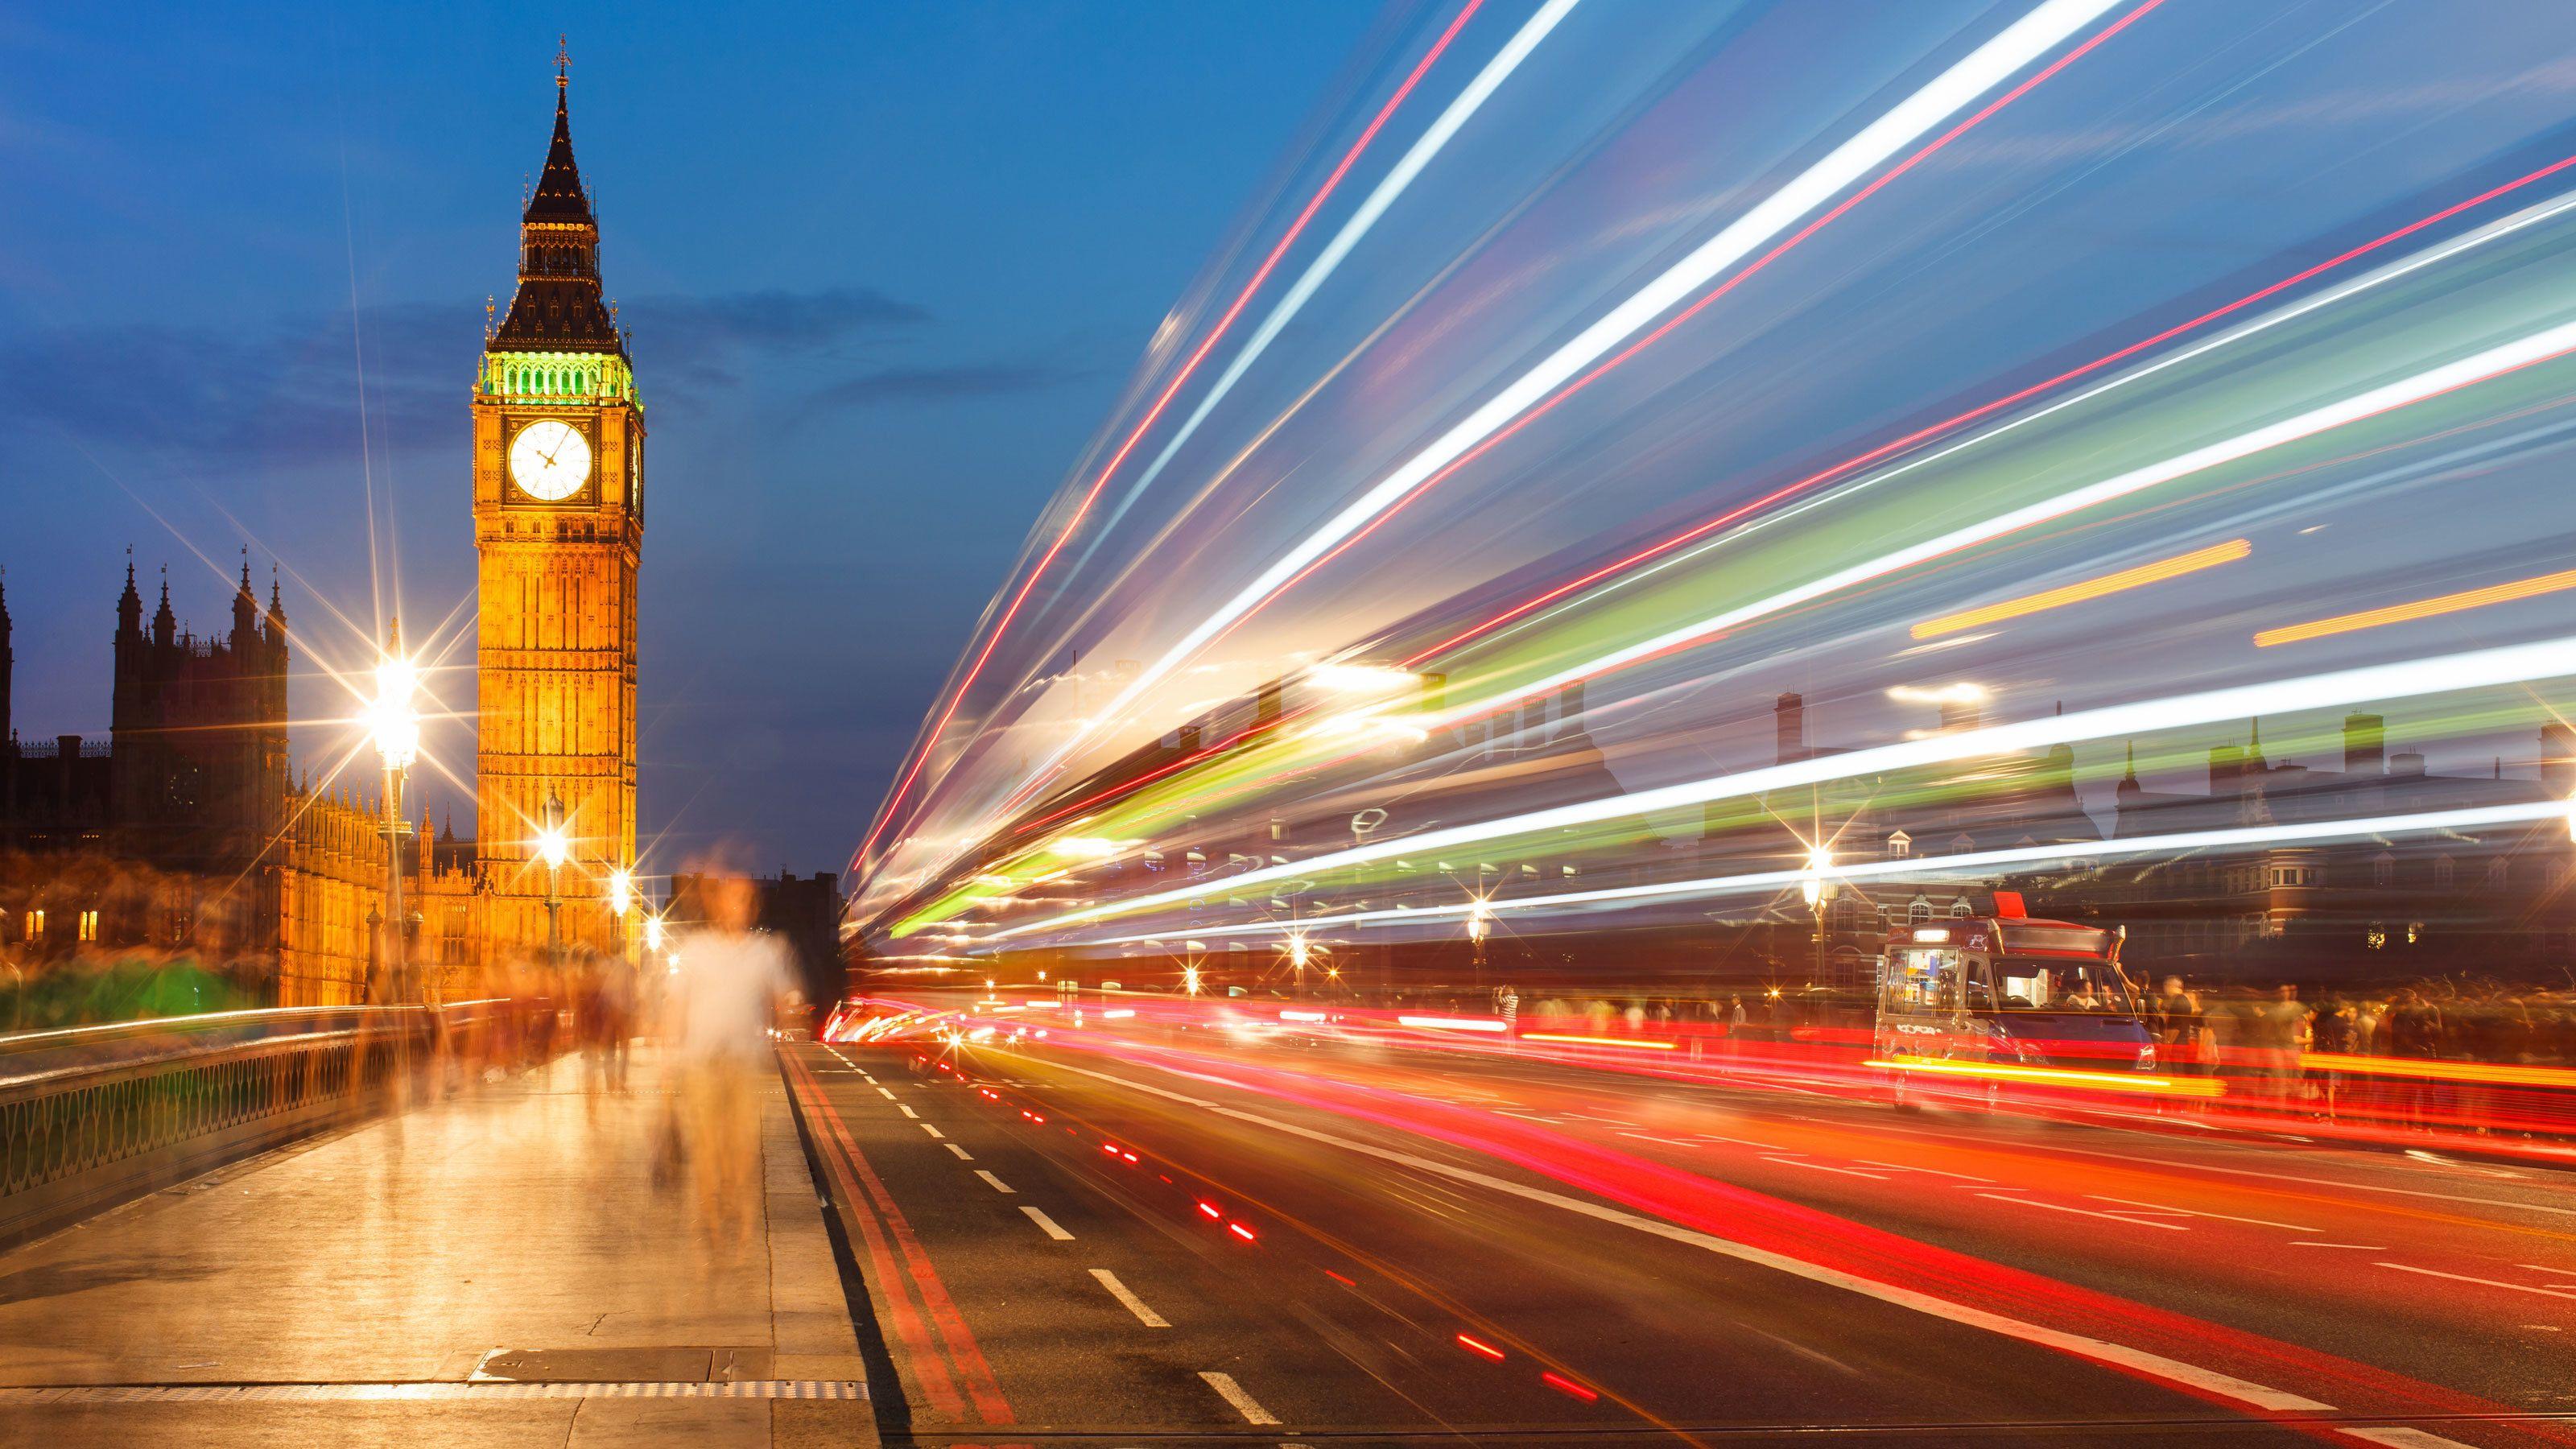 street traffic light streaks and Big Ben clock tower in London